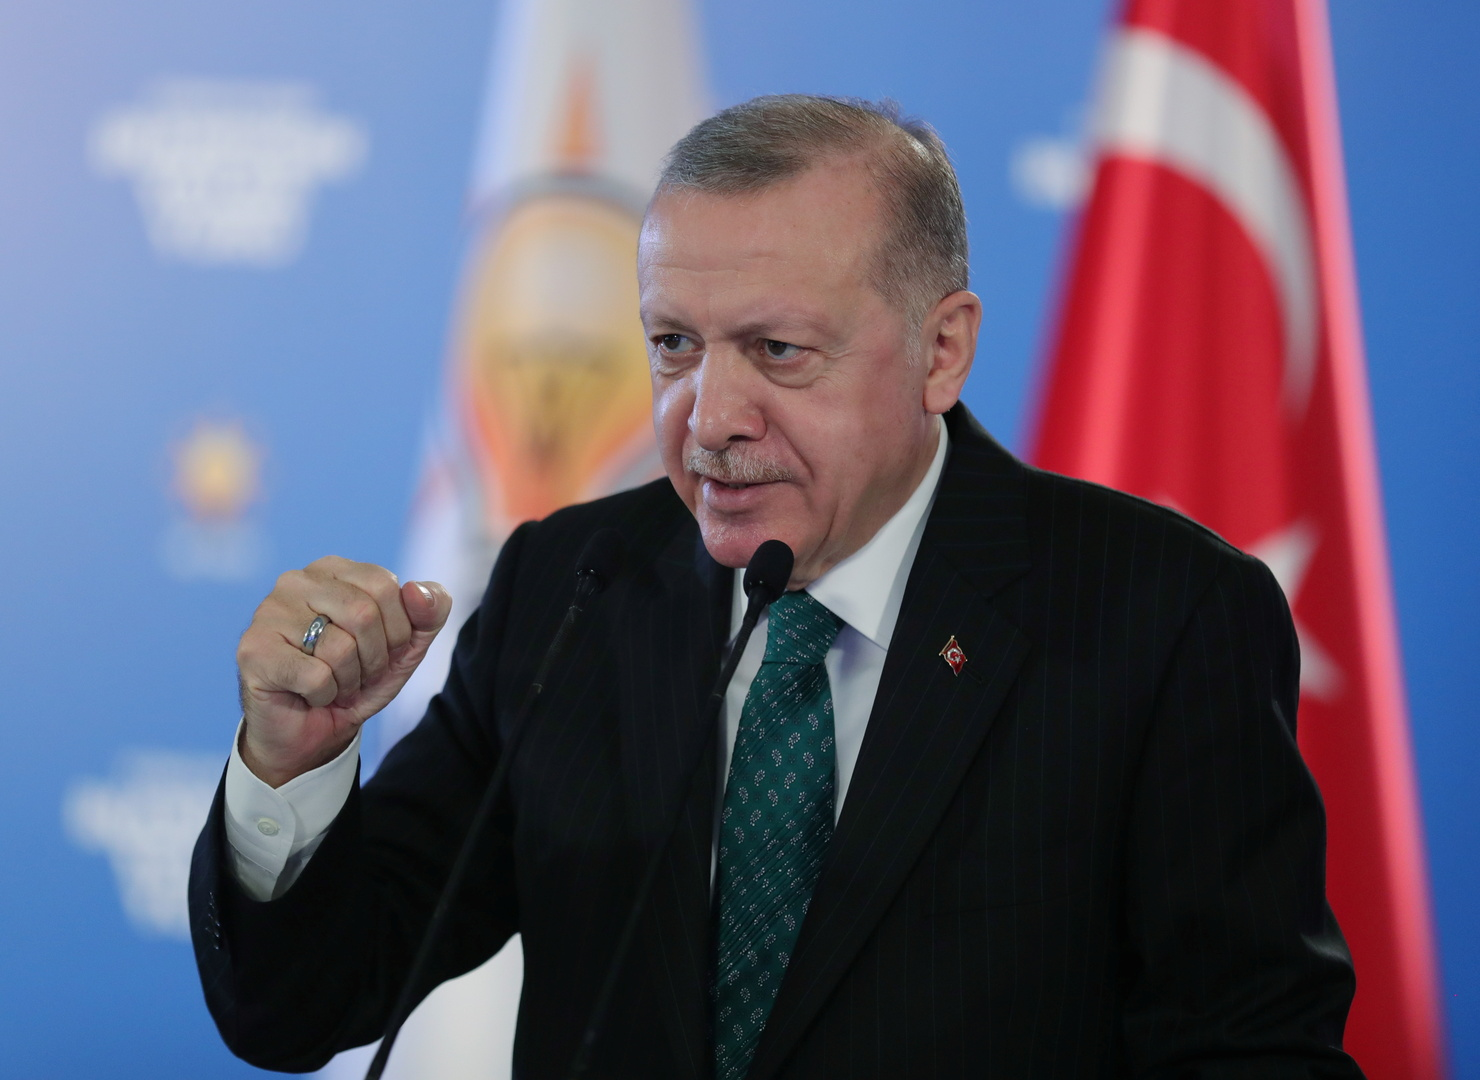 Erdogan congratulates the exiled and Dabaiba on their choice to lead the executive authority in Libya